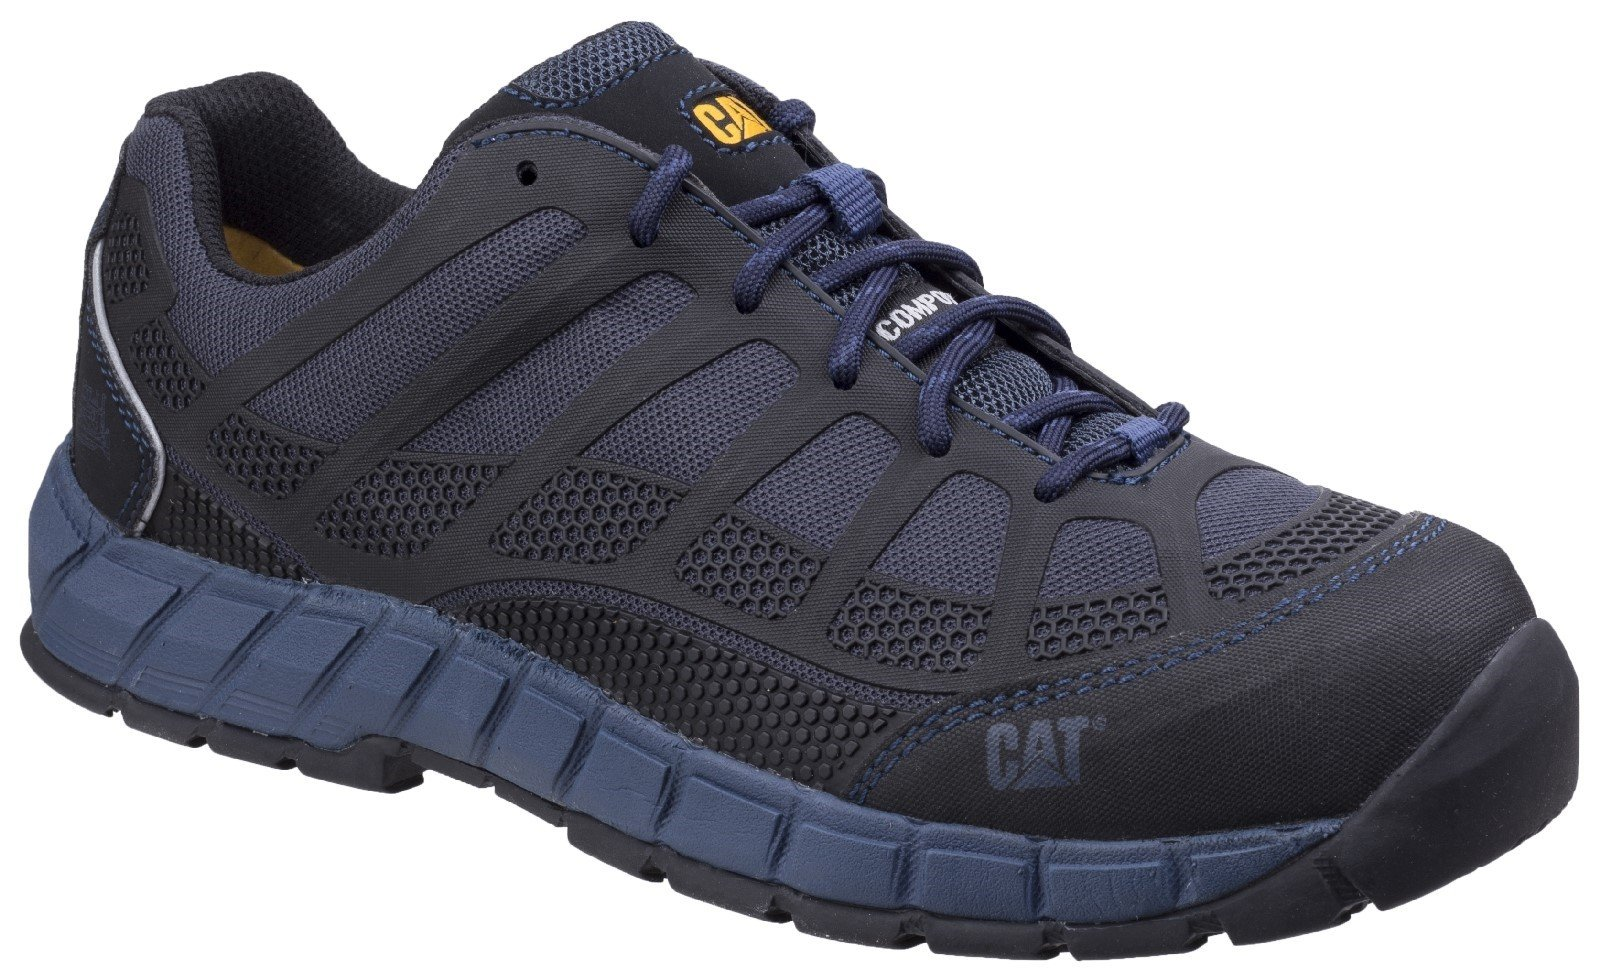 Caterpillar Men's Streamline Lightweight Trainer Blue 26948 - Blue Nite 6